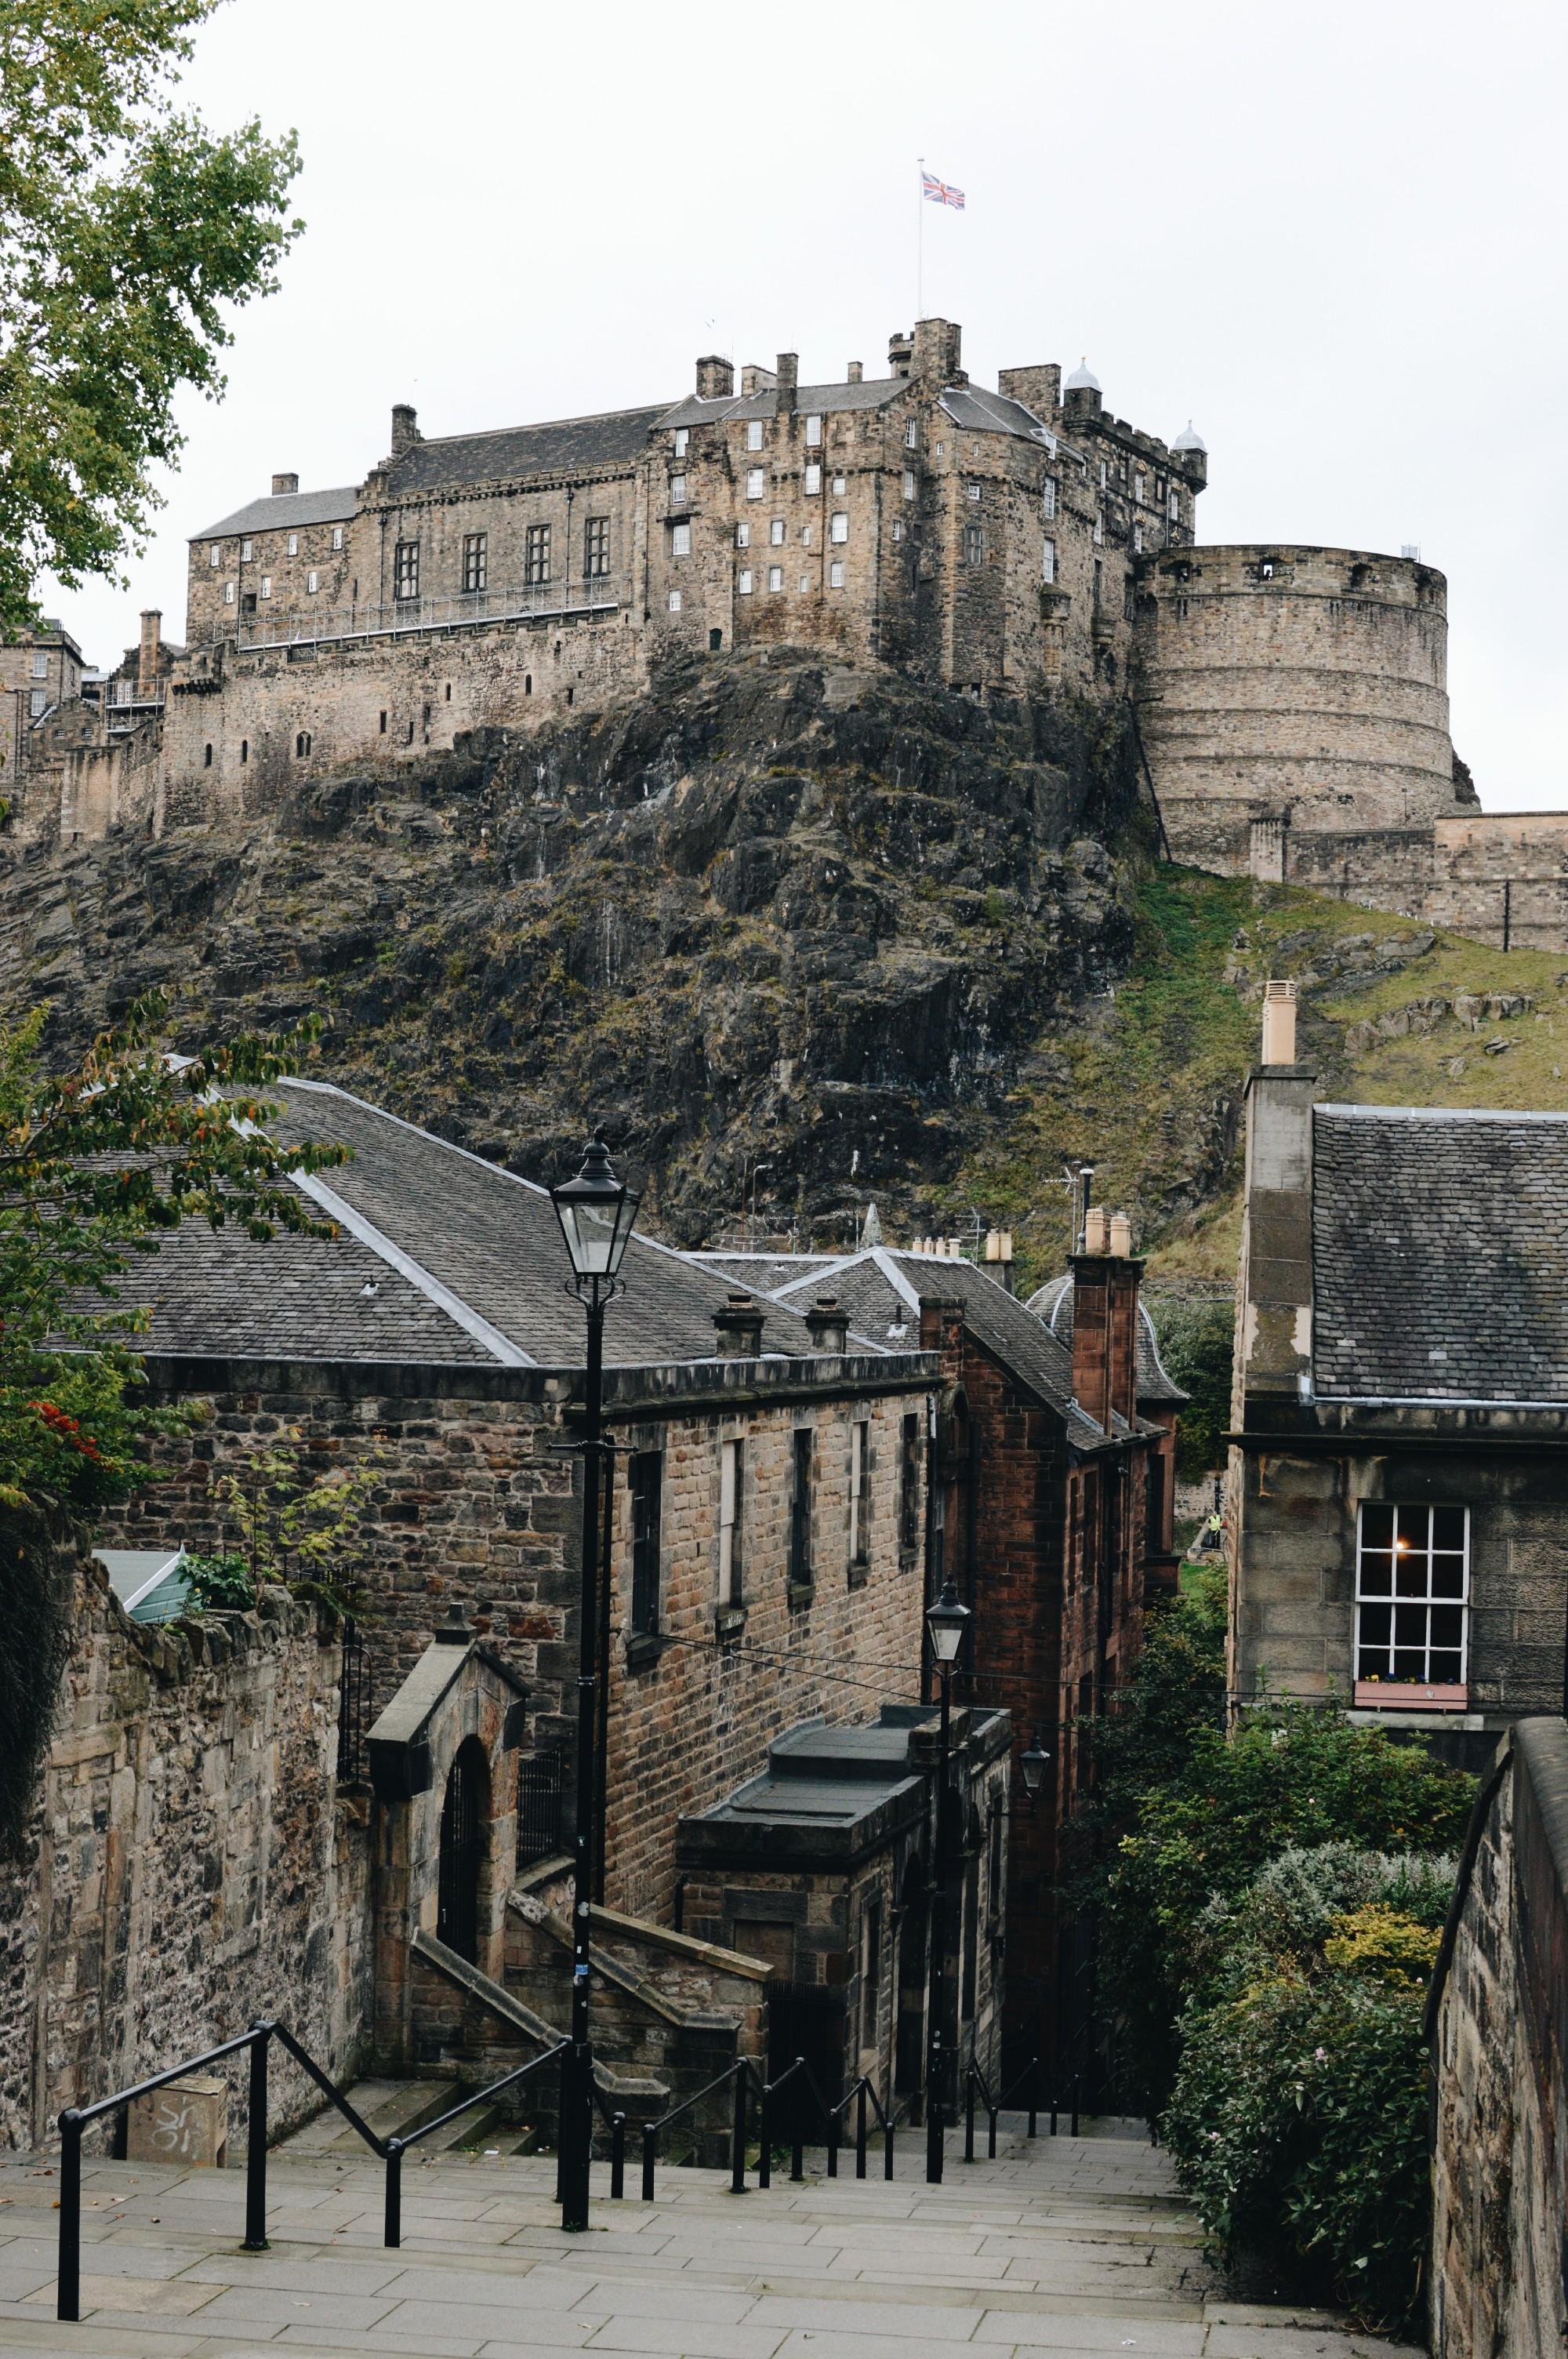 Edinburgh, among the cleanest capital cities on Earth